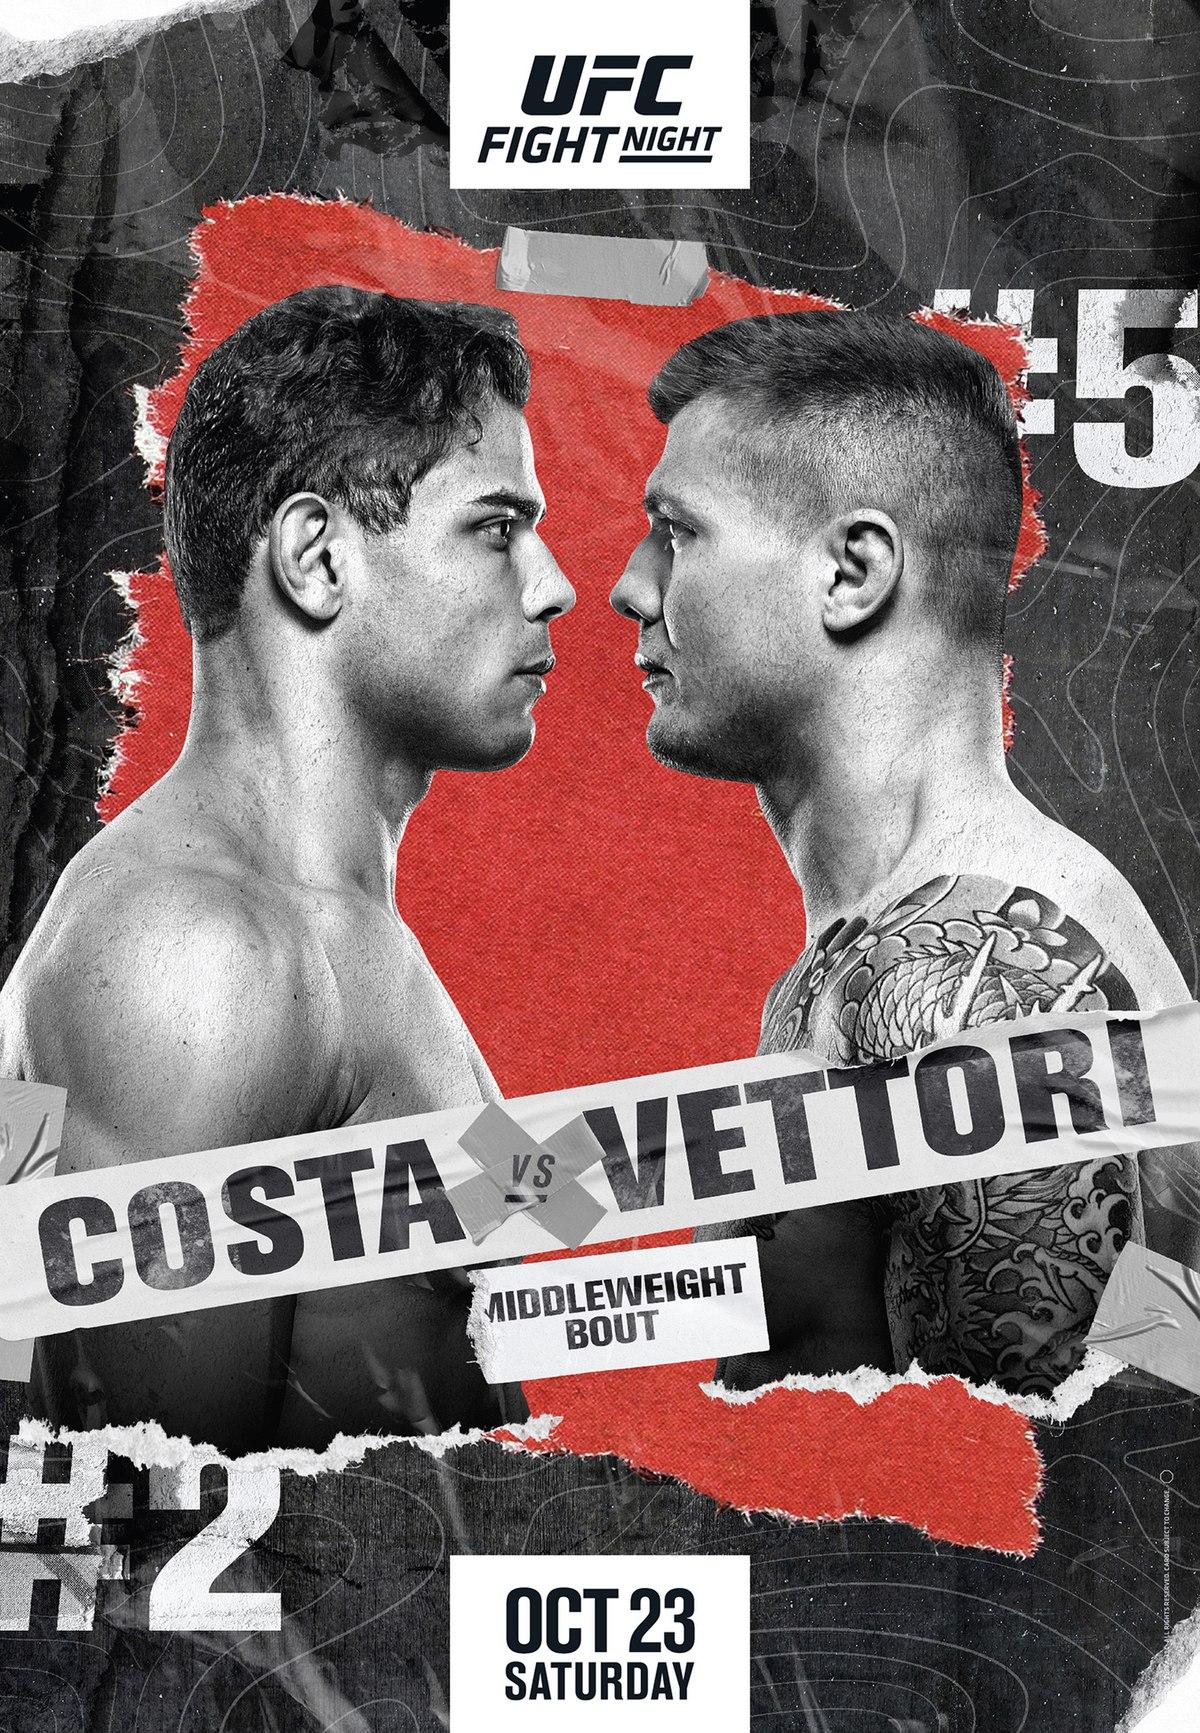 UFC Fight Night: Costa vs Vettori Fighter Salaries & Incentive Pay